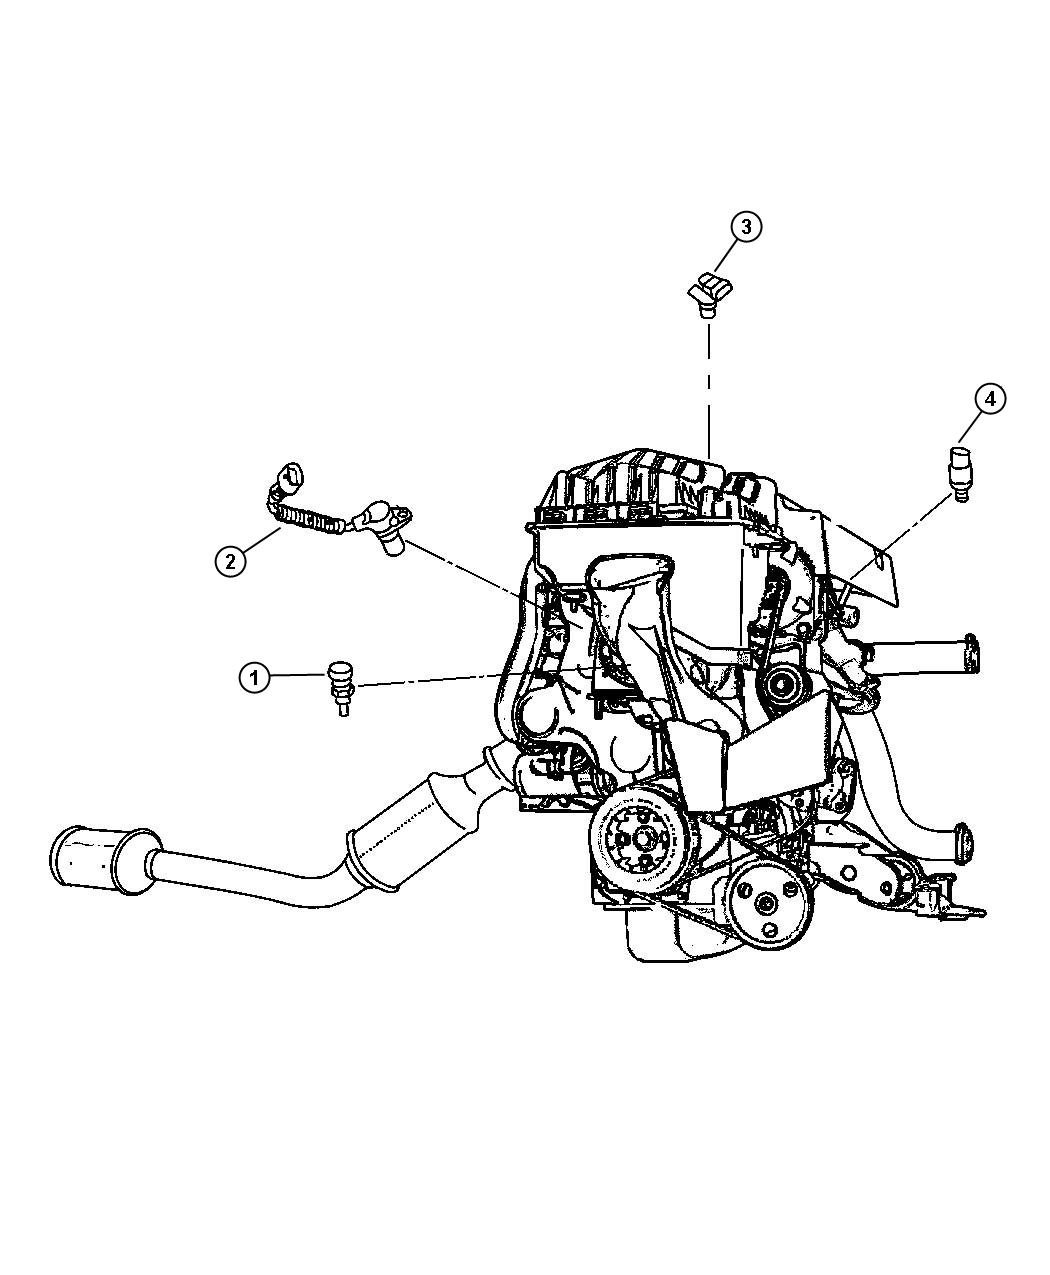 Malibu 3 1 Engine Diagram